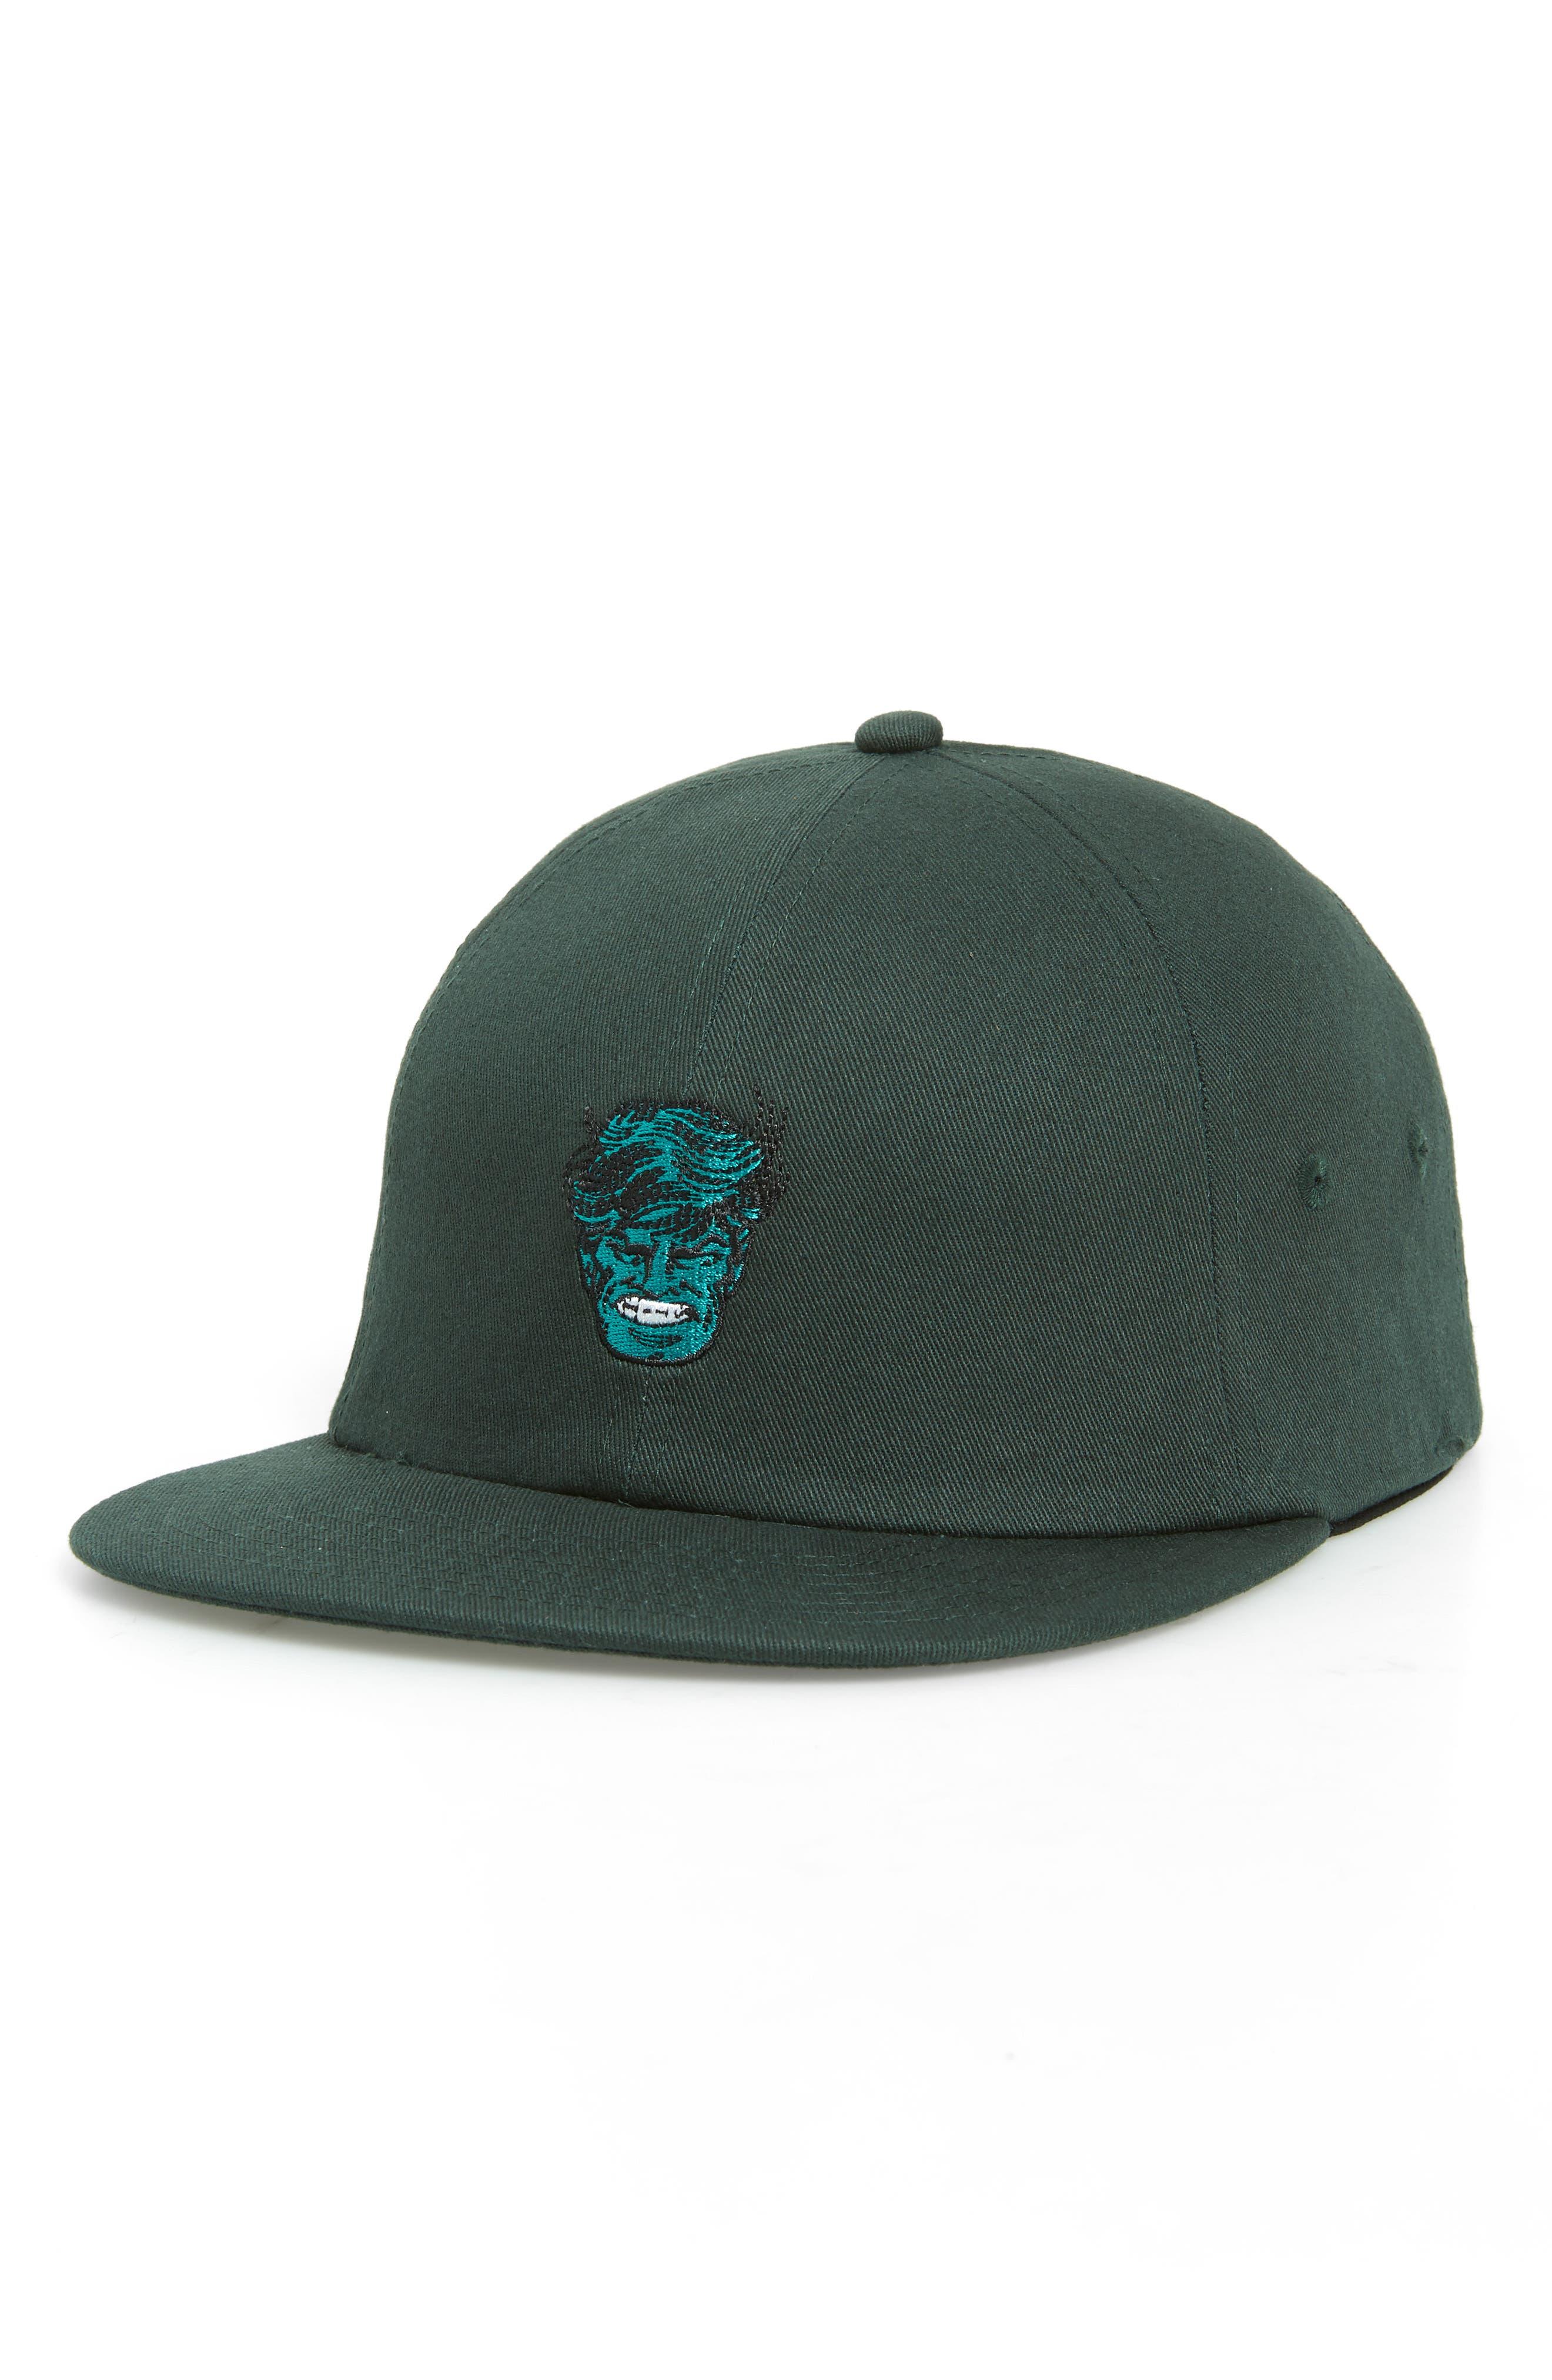 x Marvel Baseball Cap,                         Main,                         color, DARKEST SPRUCE